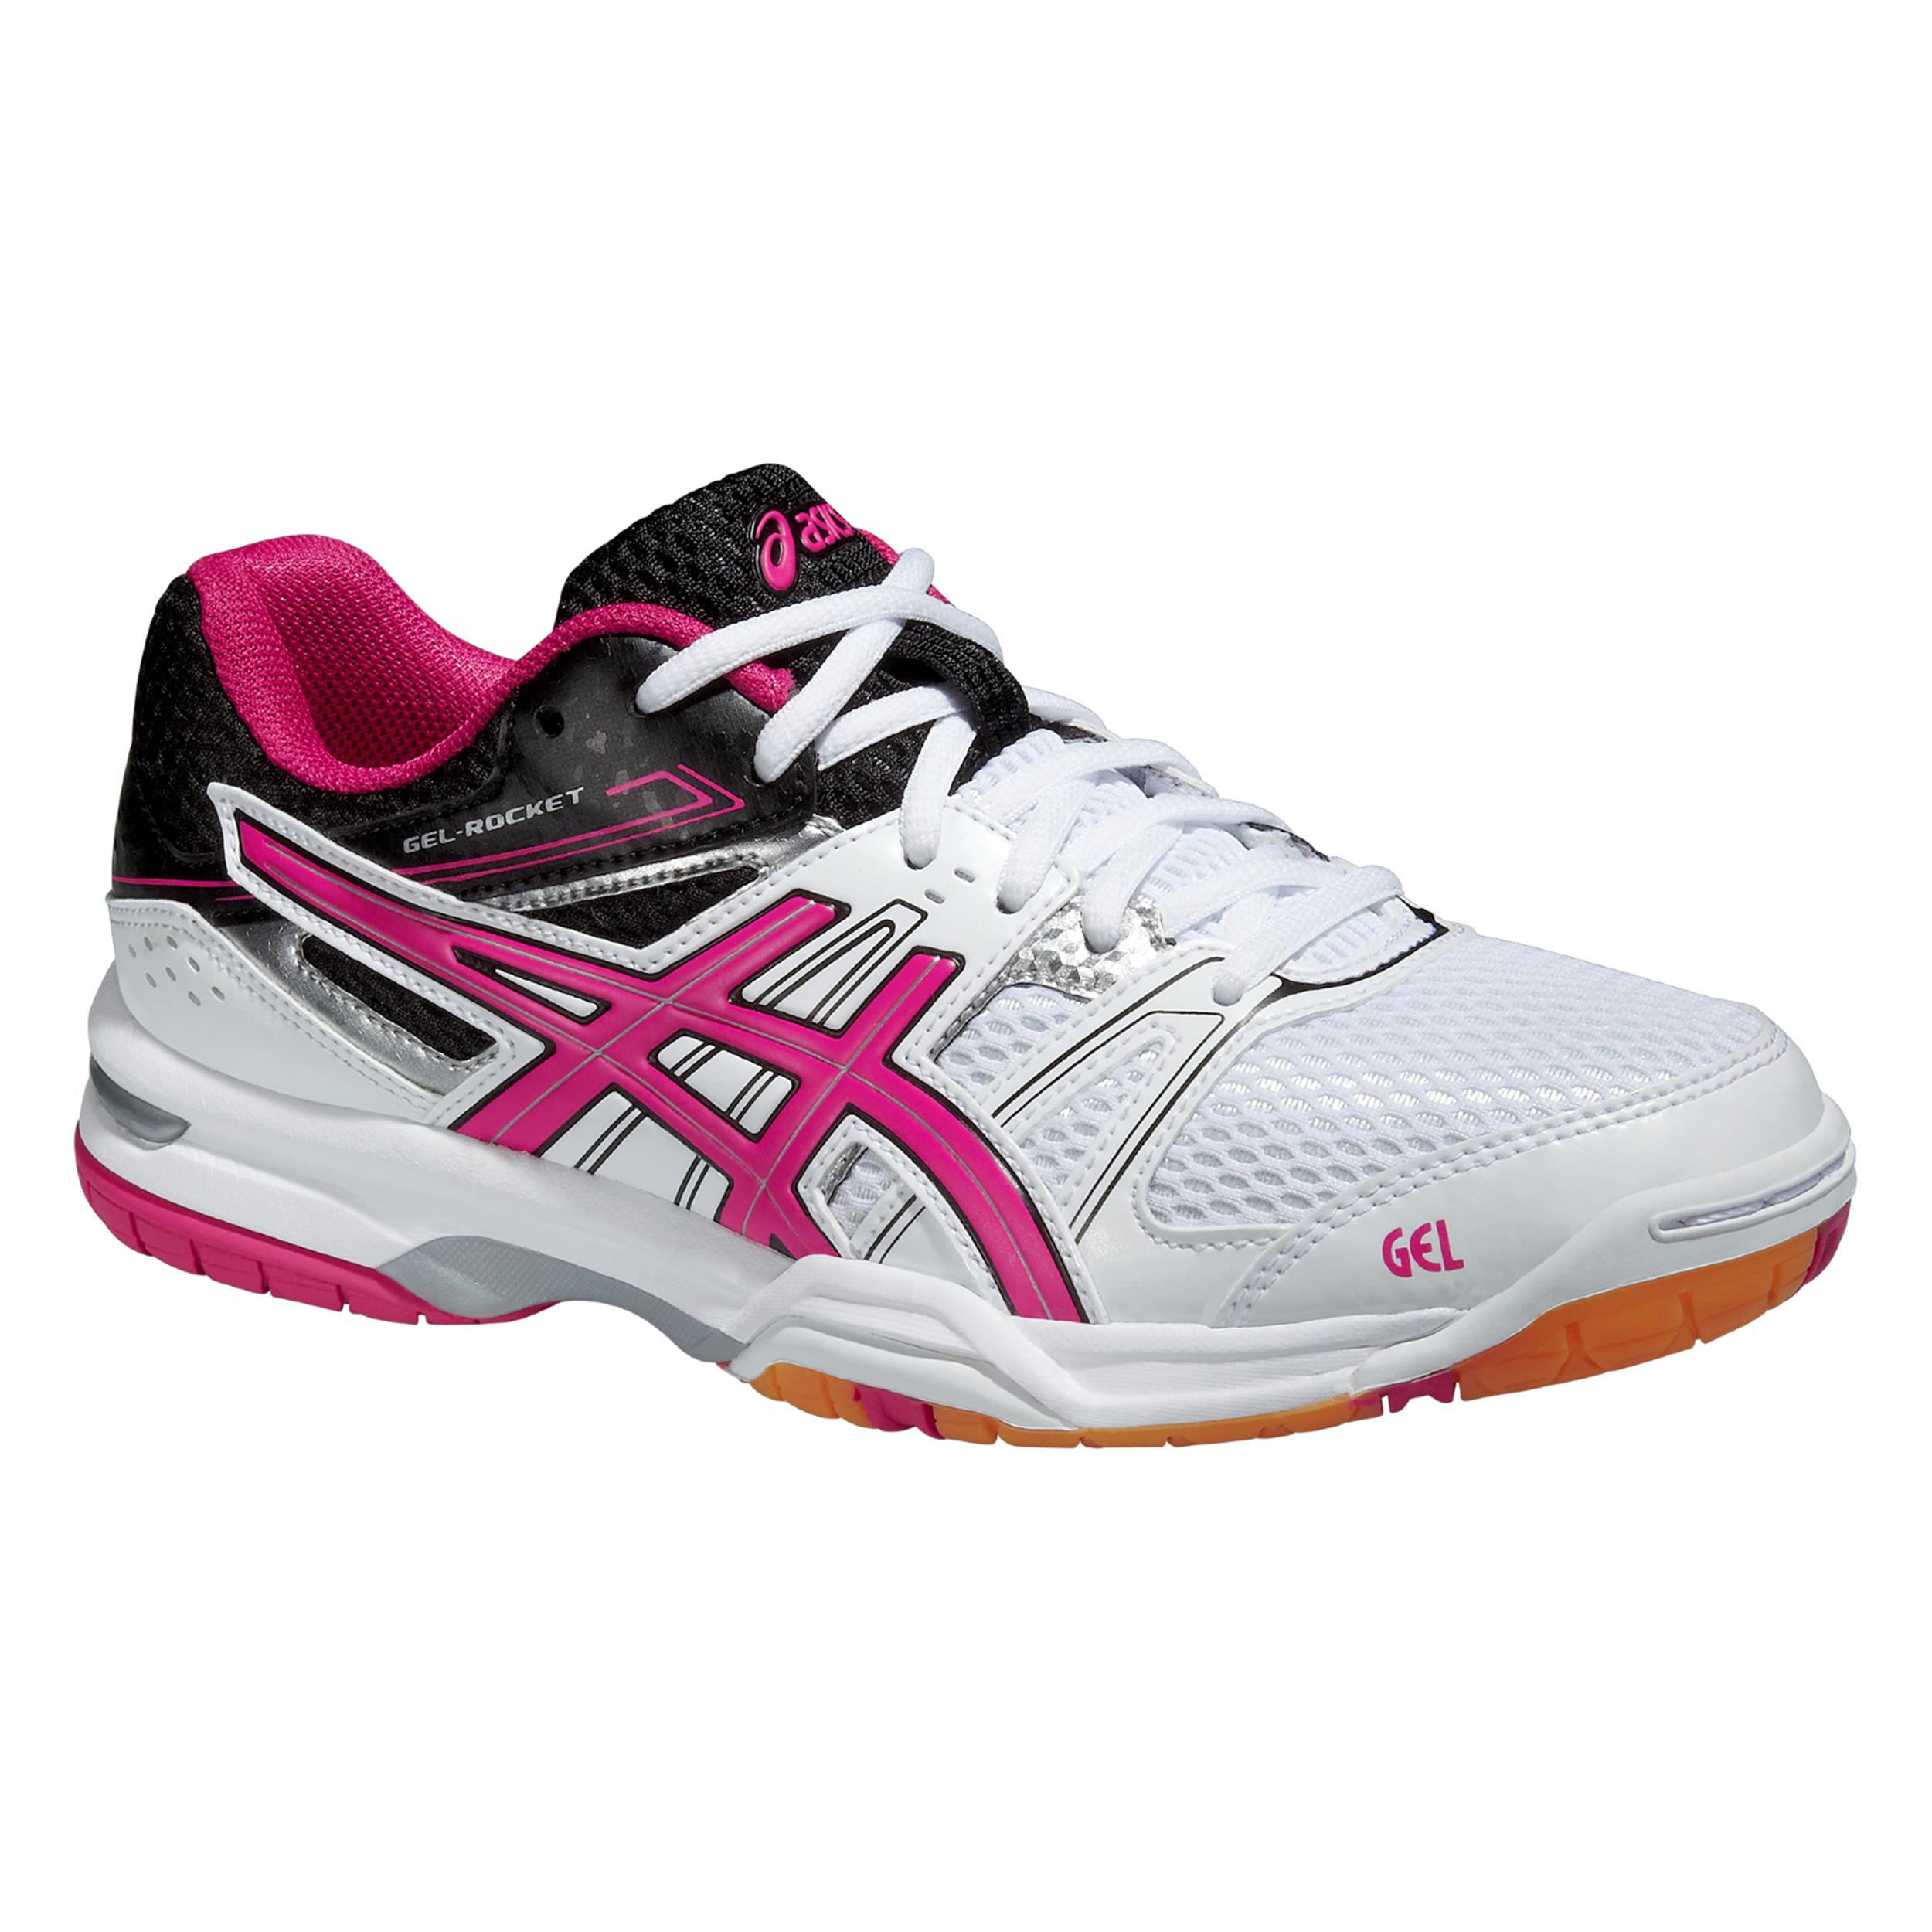 Asics Badmintonschoenen - squashschoenen dames Gel Rocket 7 wit/roze